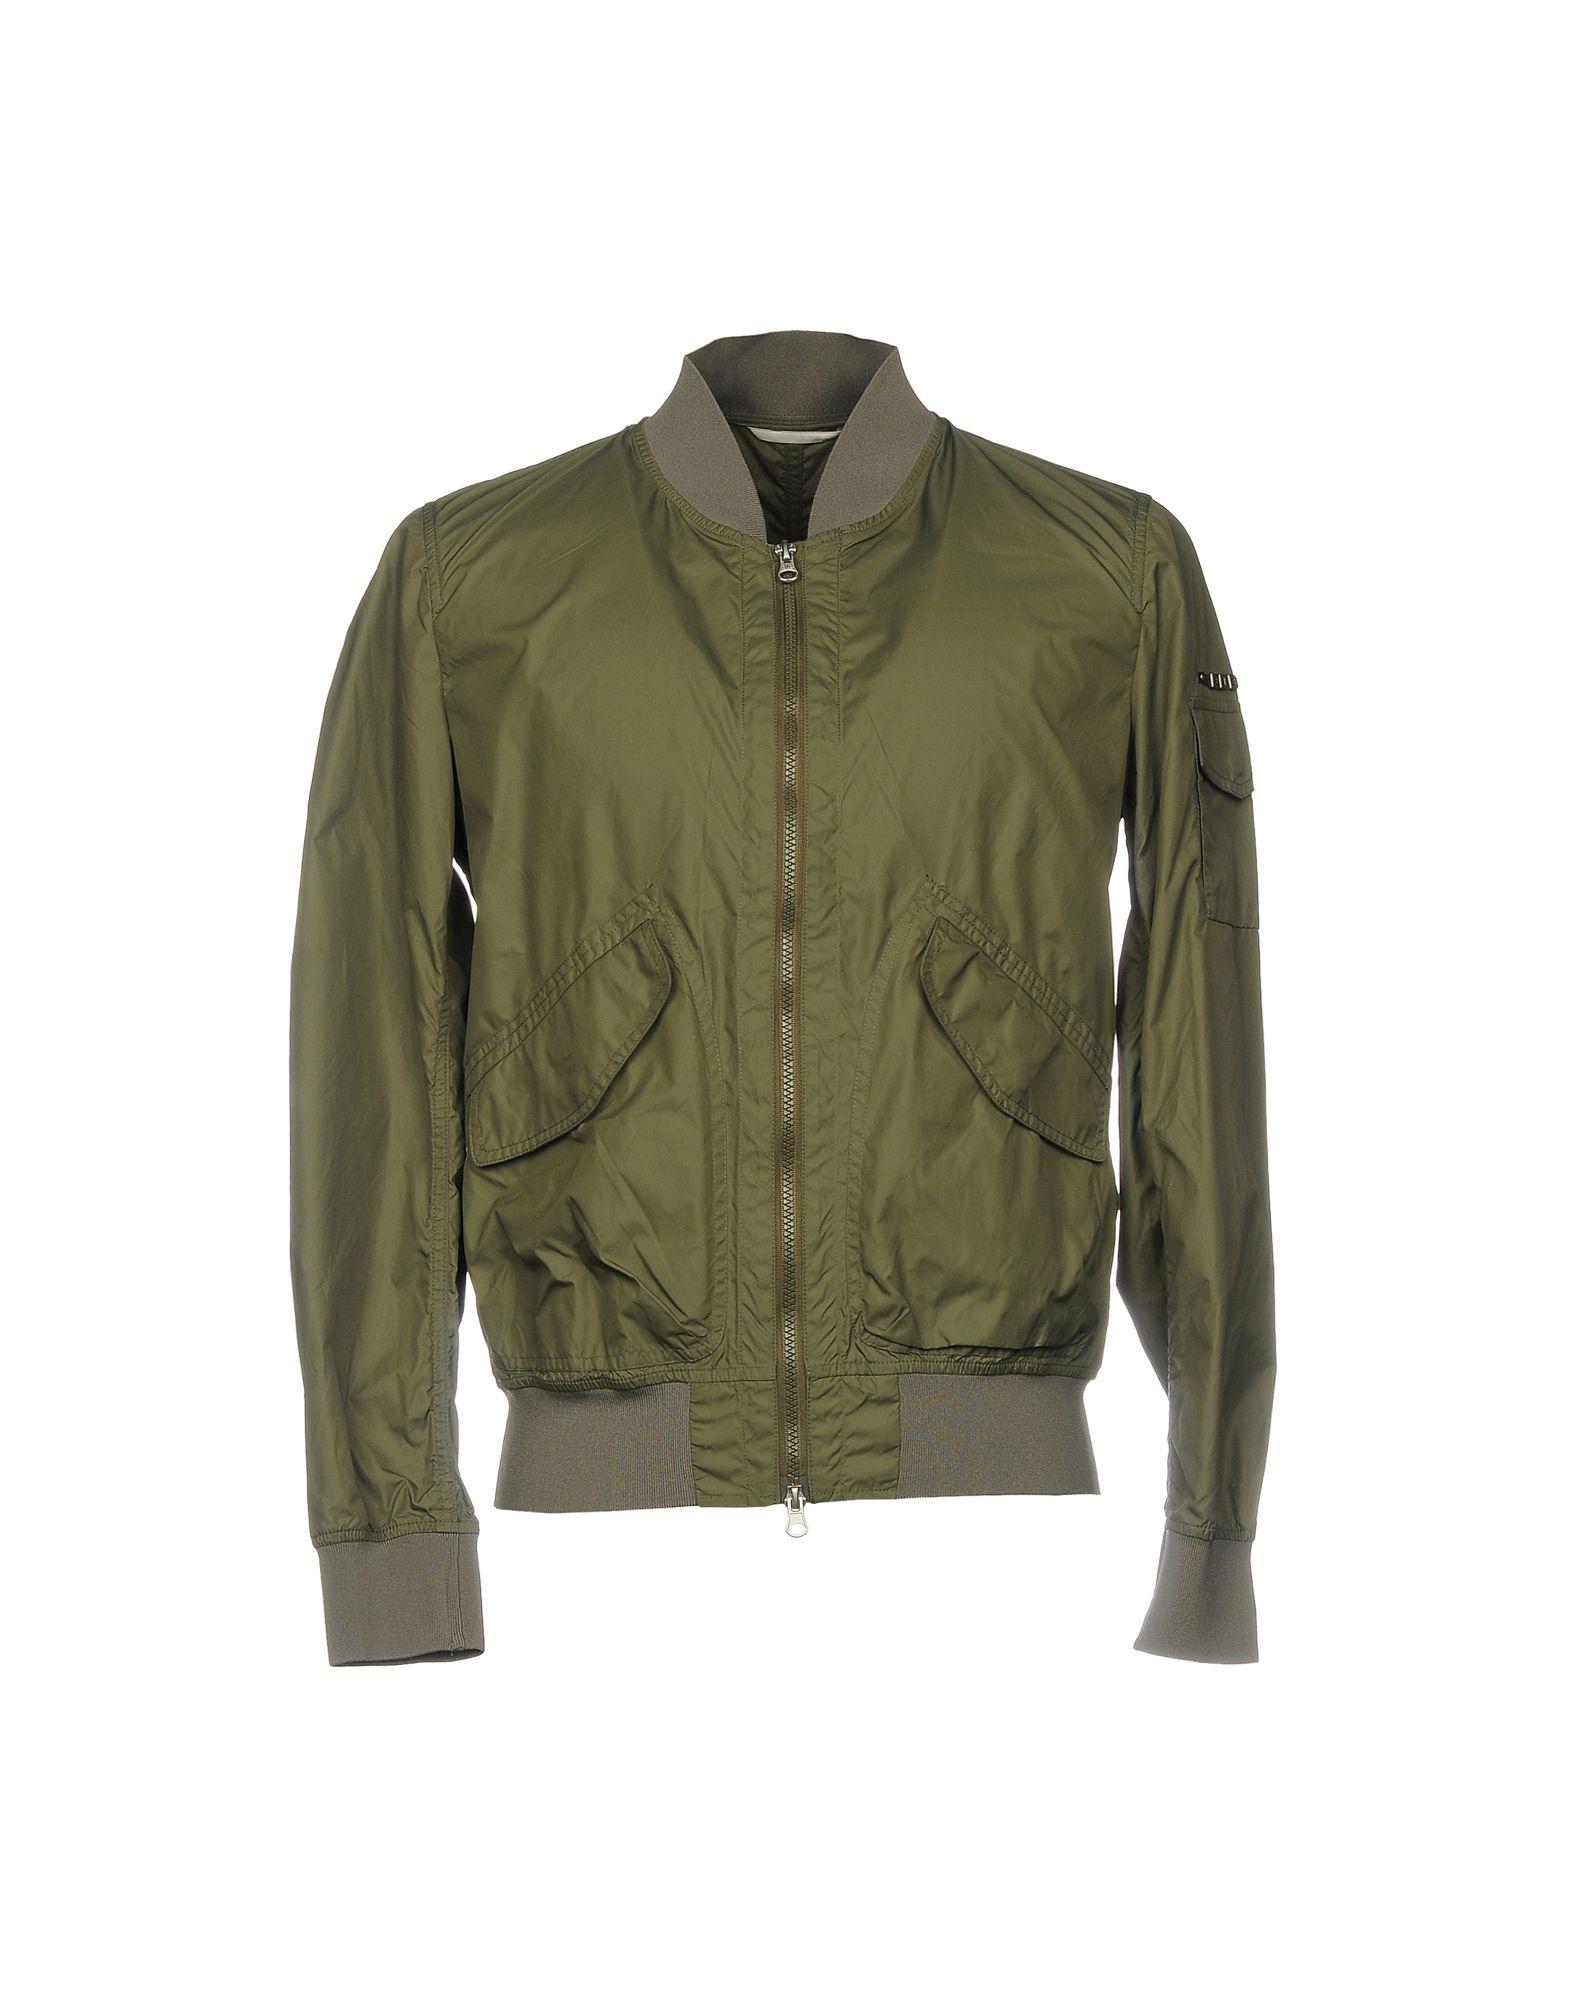 313 TRE UNO TRE Куртка 313 tre uno tre куртка